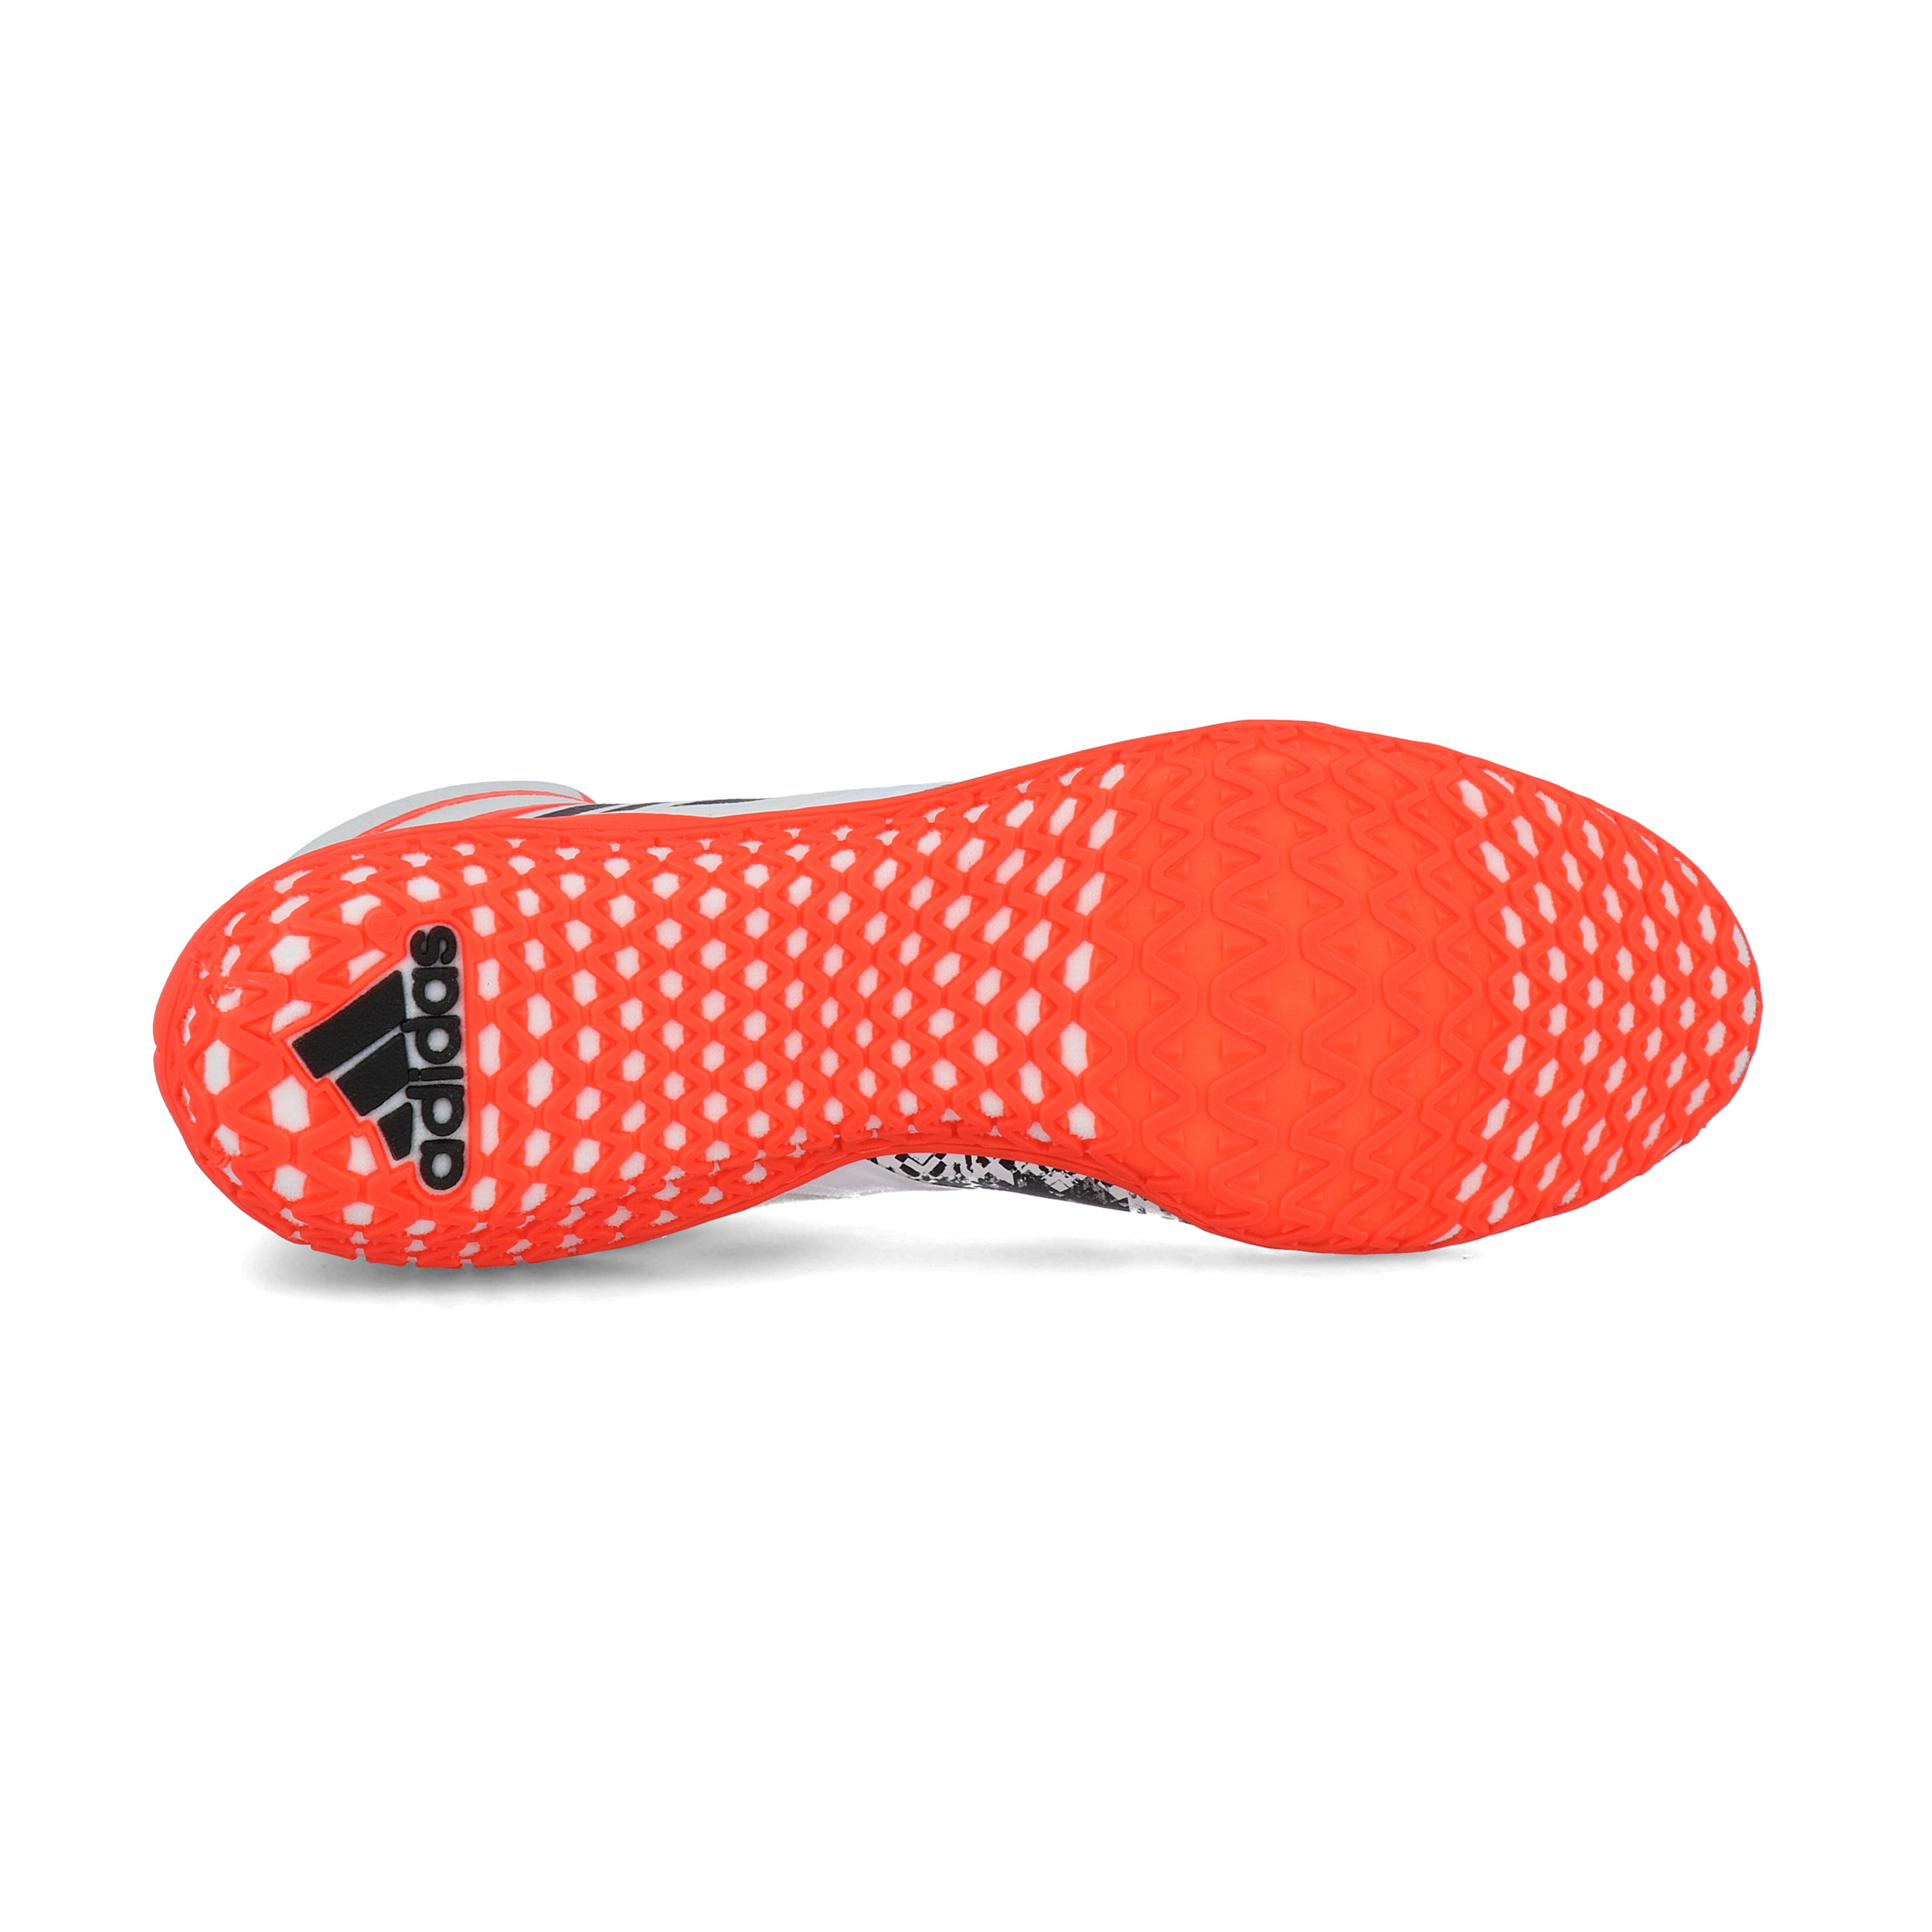 Dettagli su adidas Uomo Flying Impact Scarpe Da Ginnastica Lotta Sport Nero Arancione Bianco